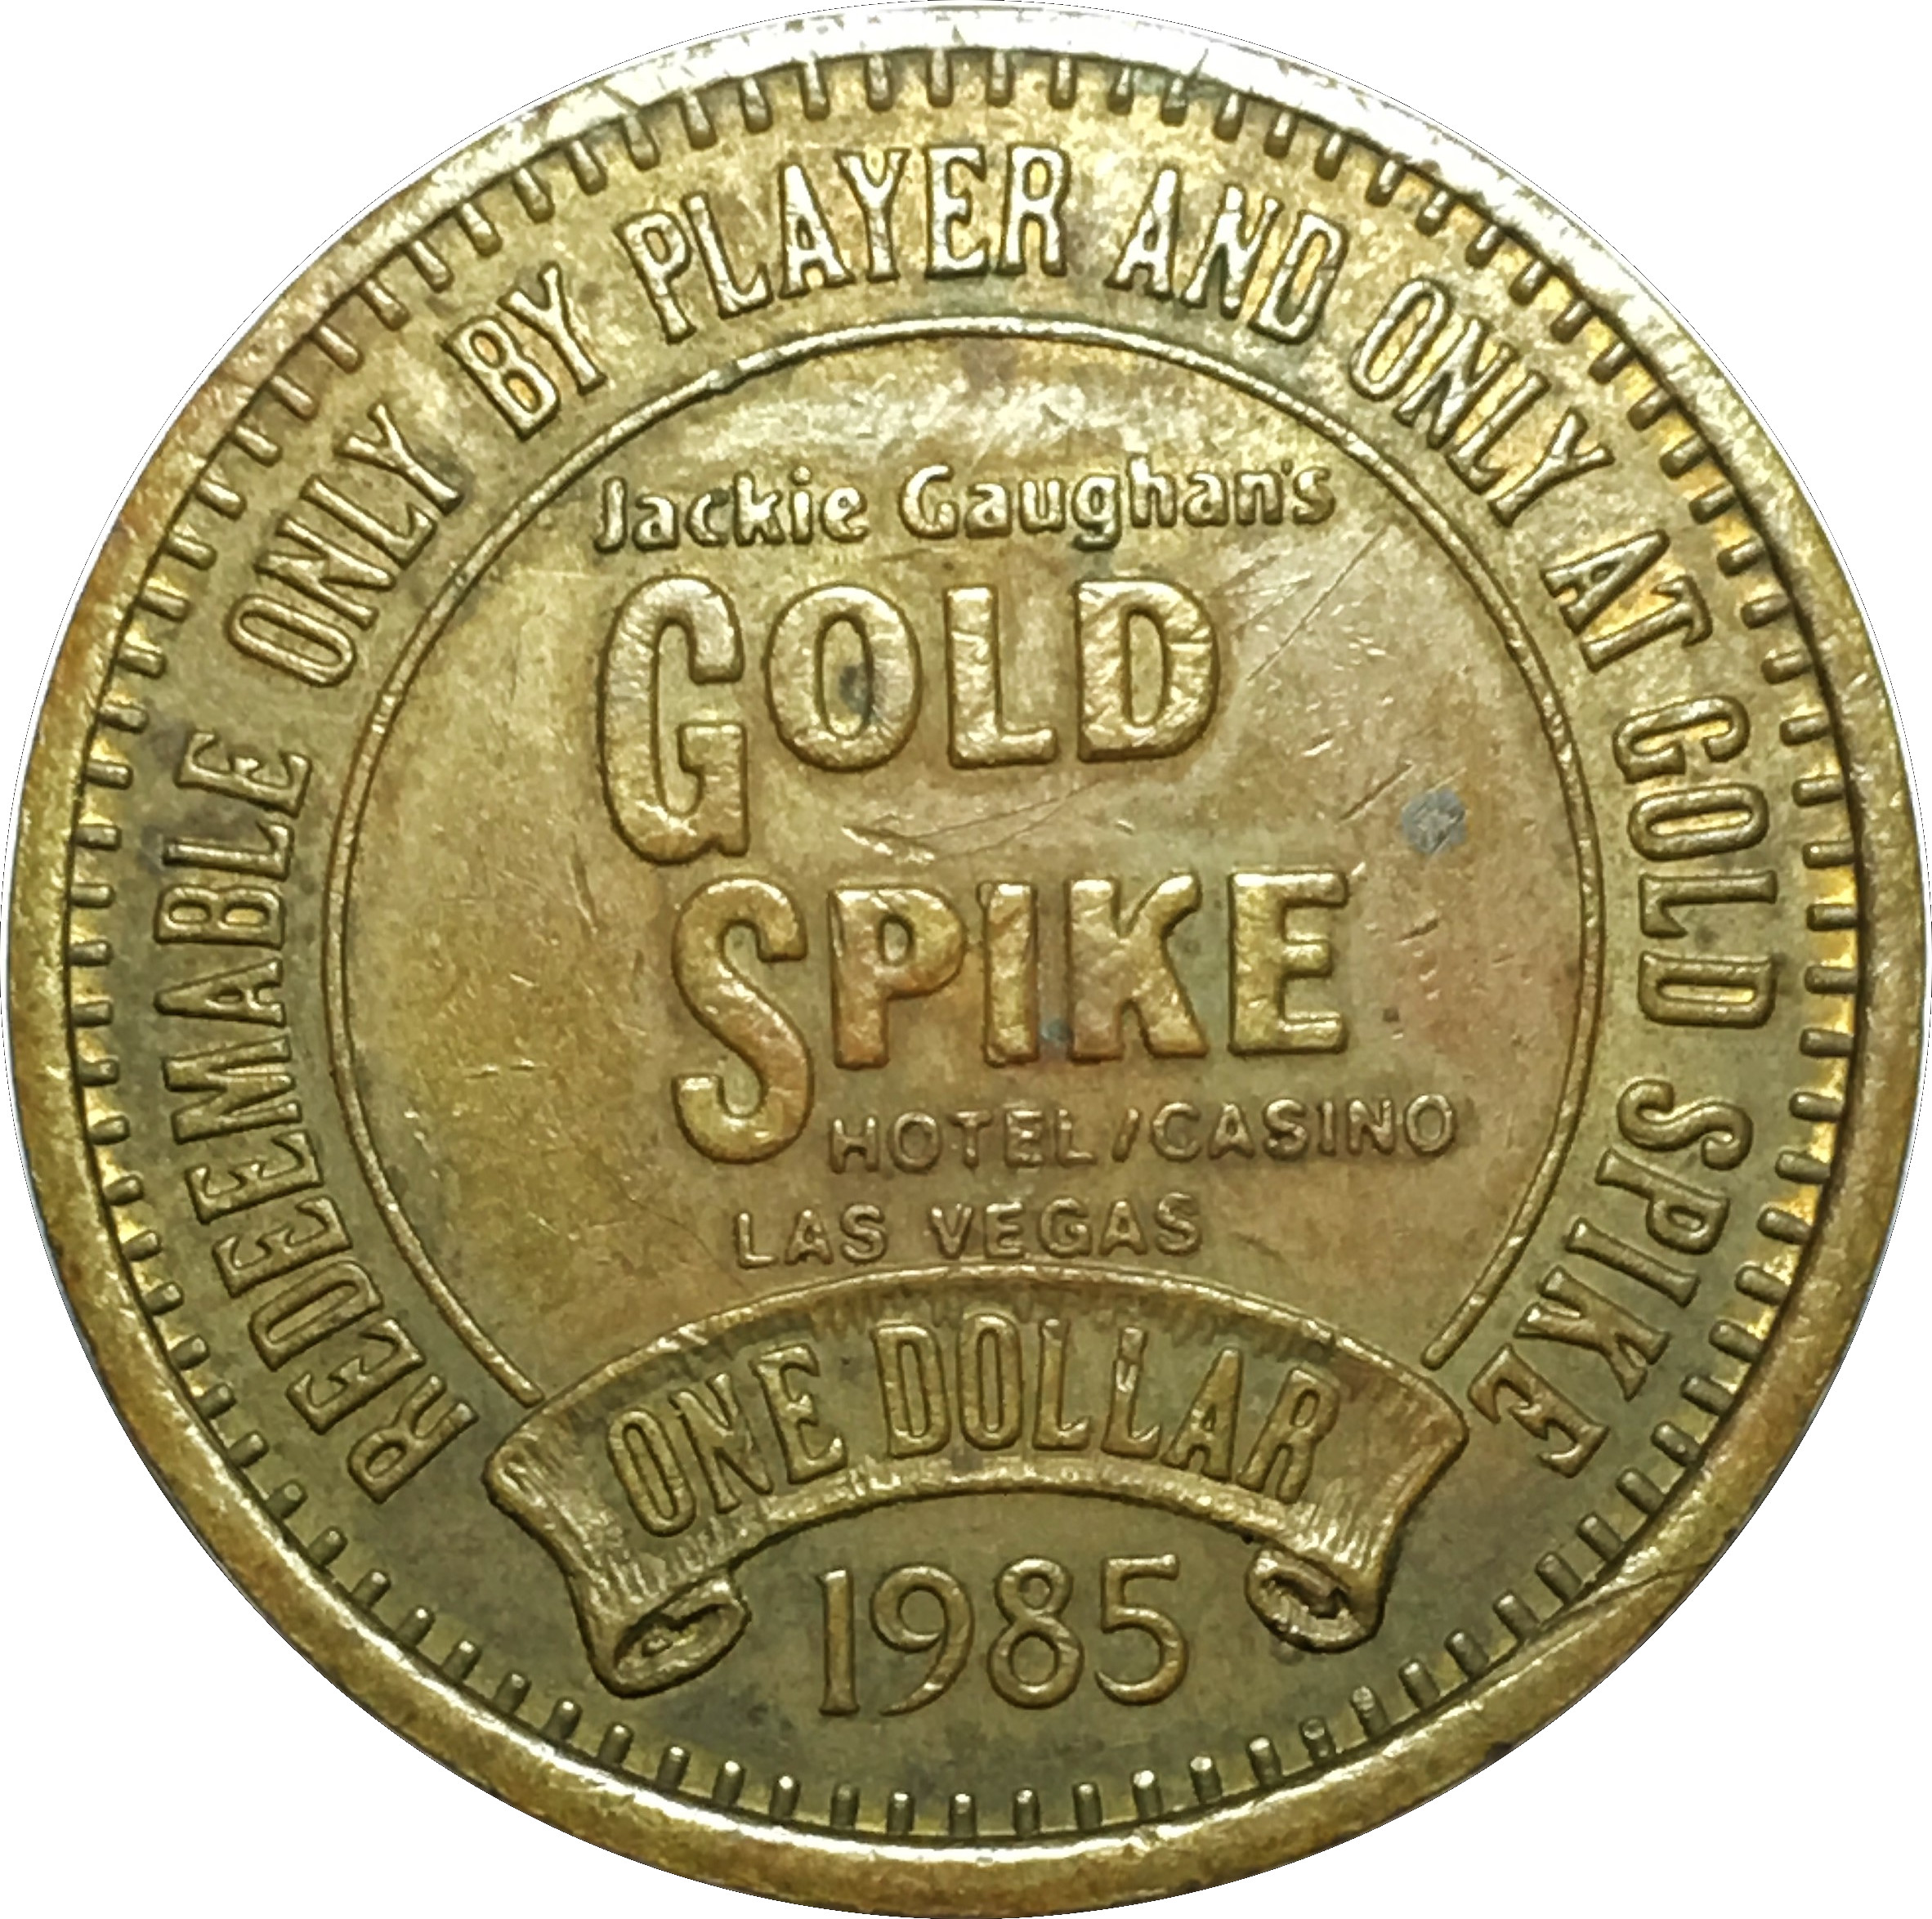 Gold spike casino sale back casino money